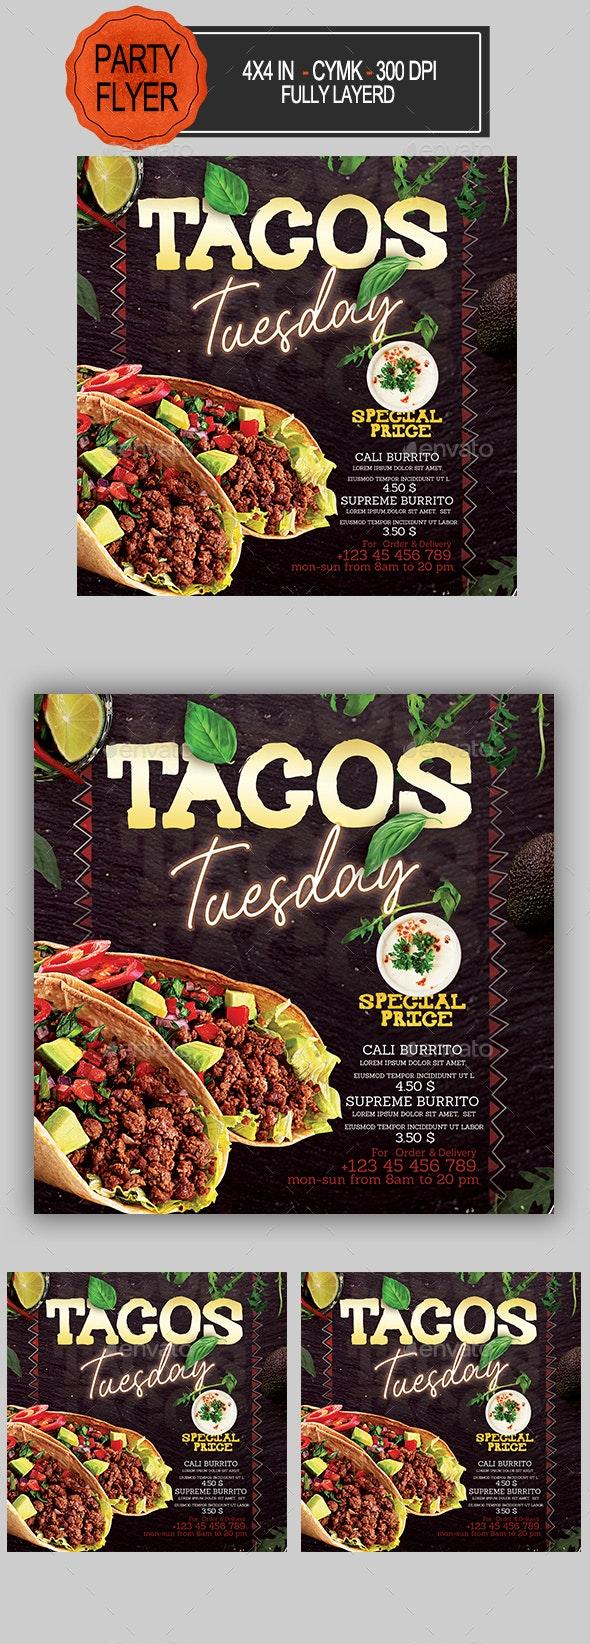 Tacos Flyer - Restaurant Flyers